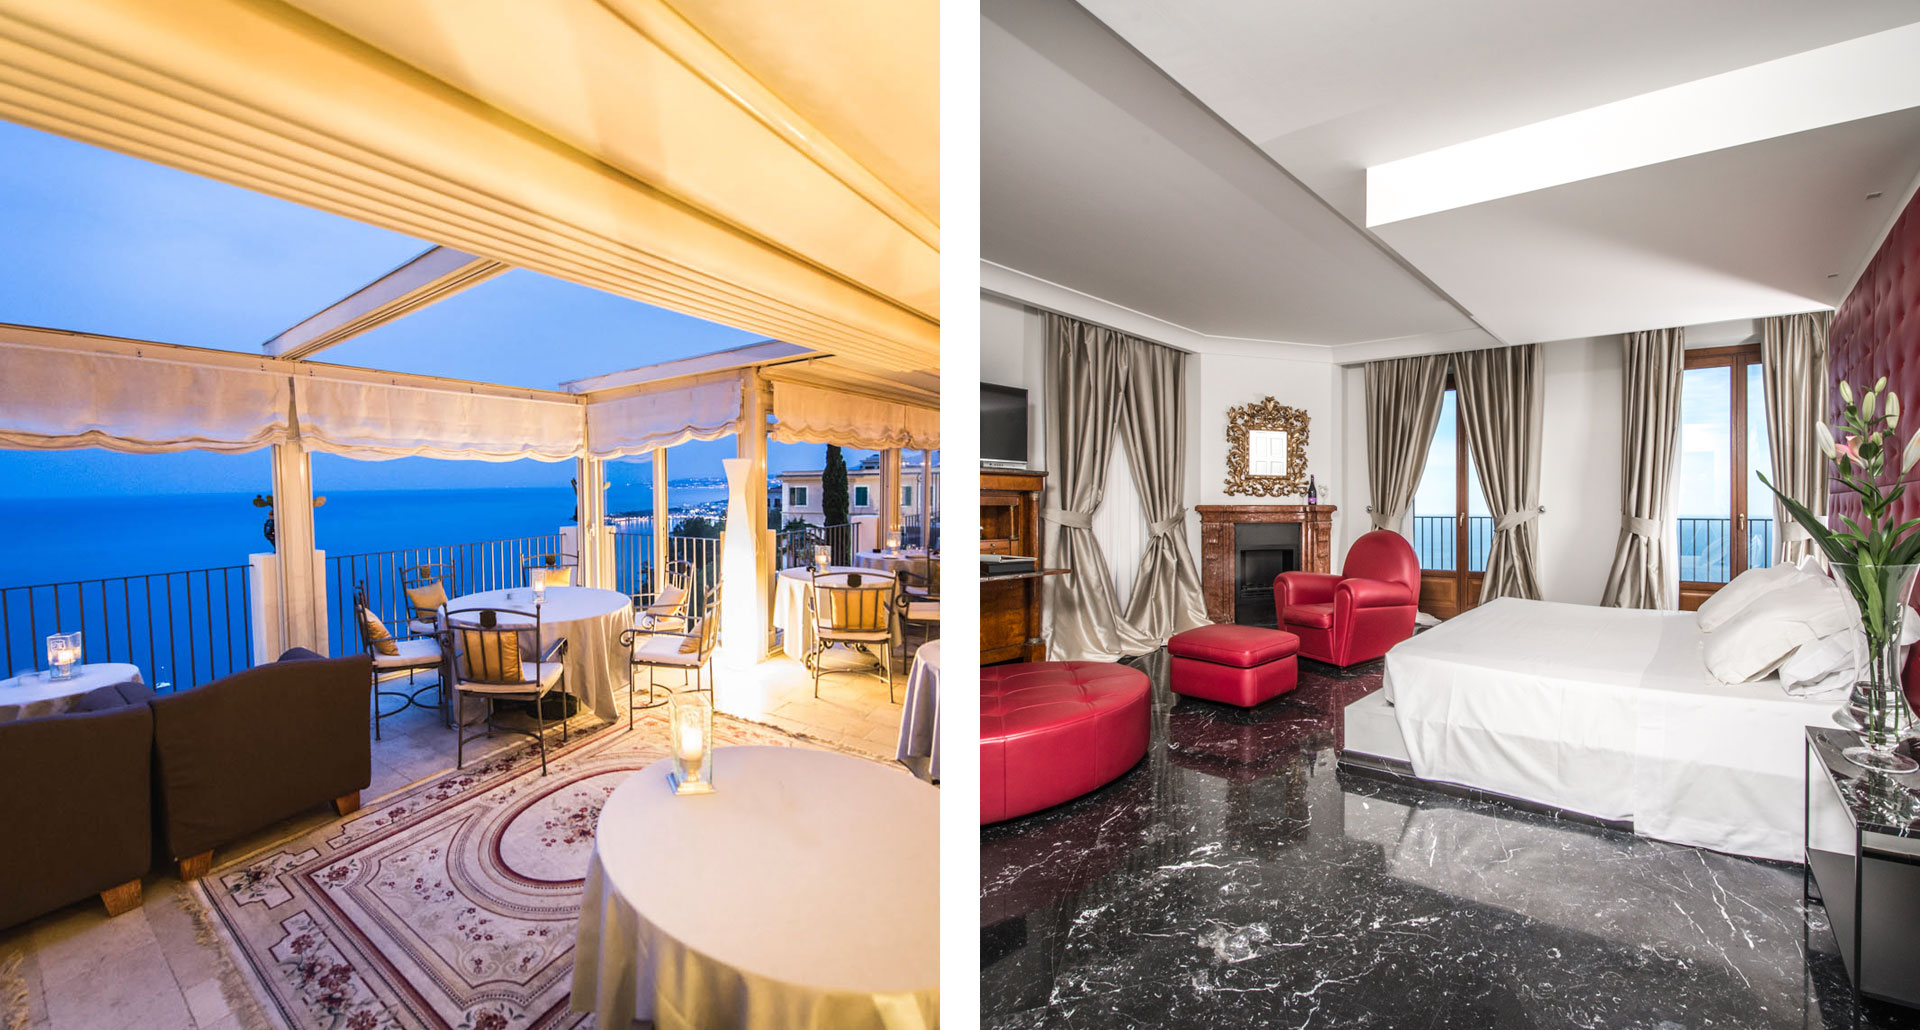 Metropole Taormina Maison d'Hotes - boutique hotel in Taormina